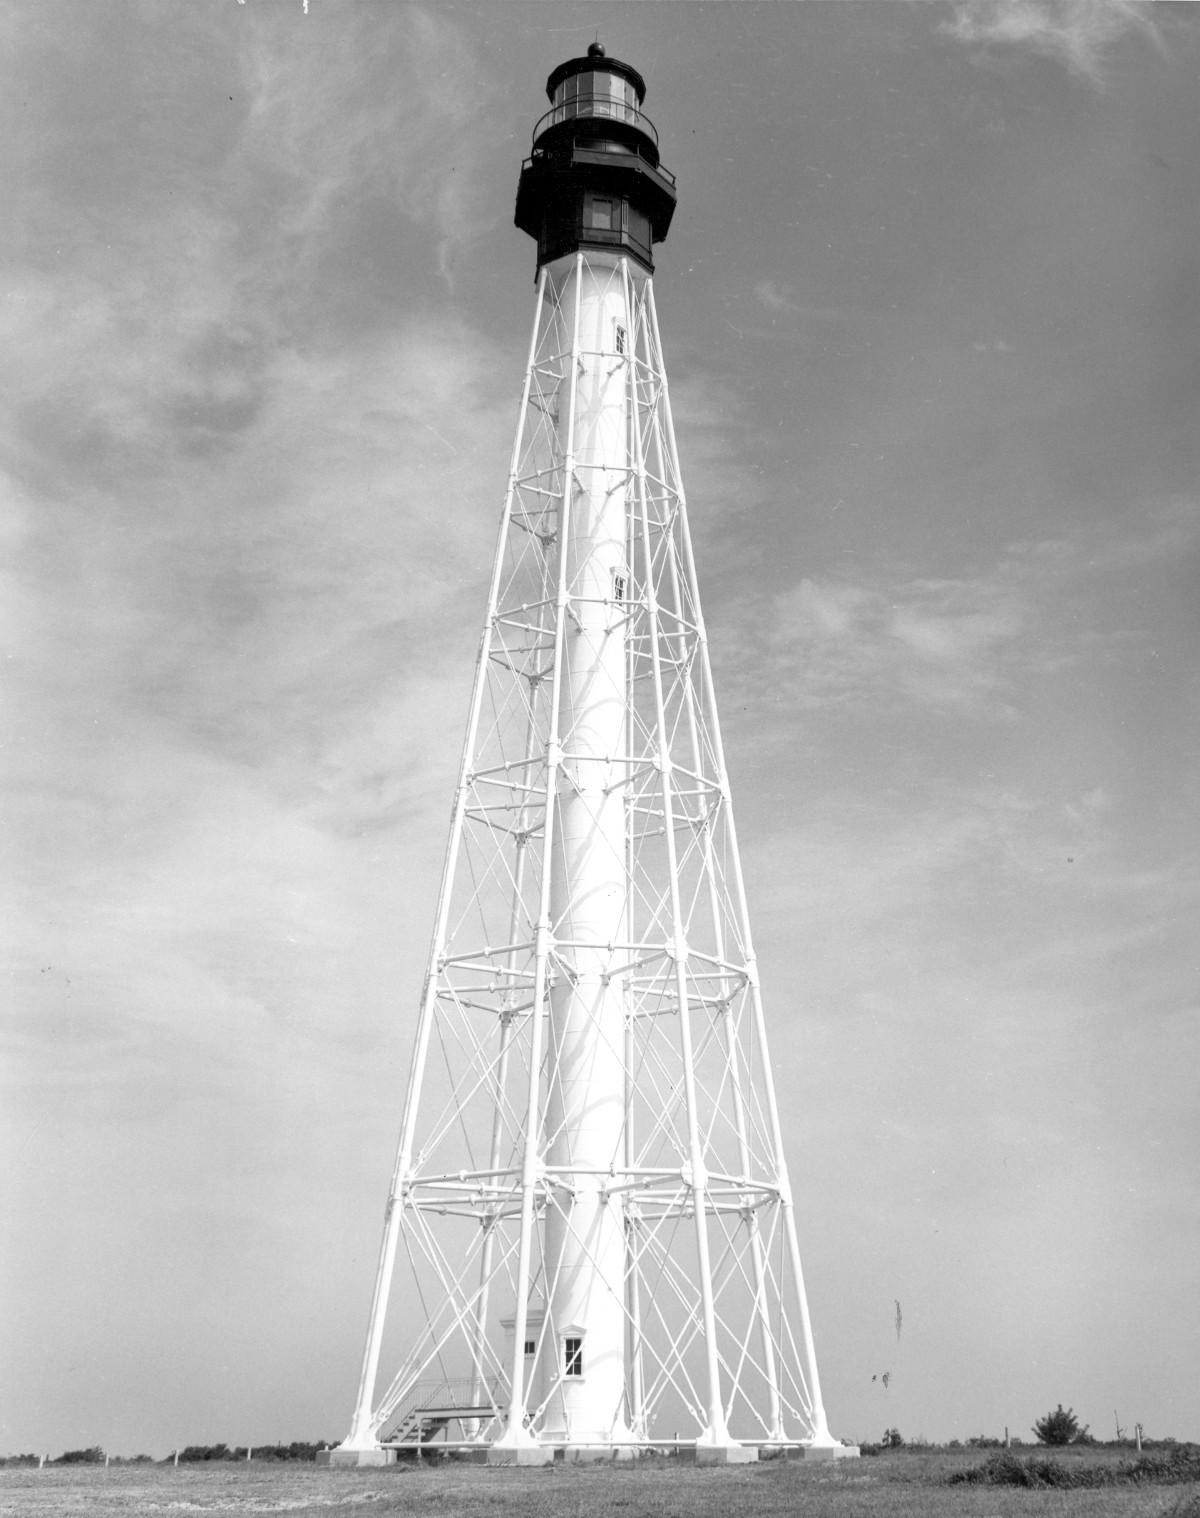 Cape Charles Light Station